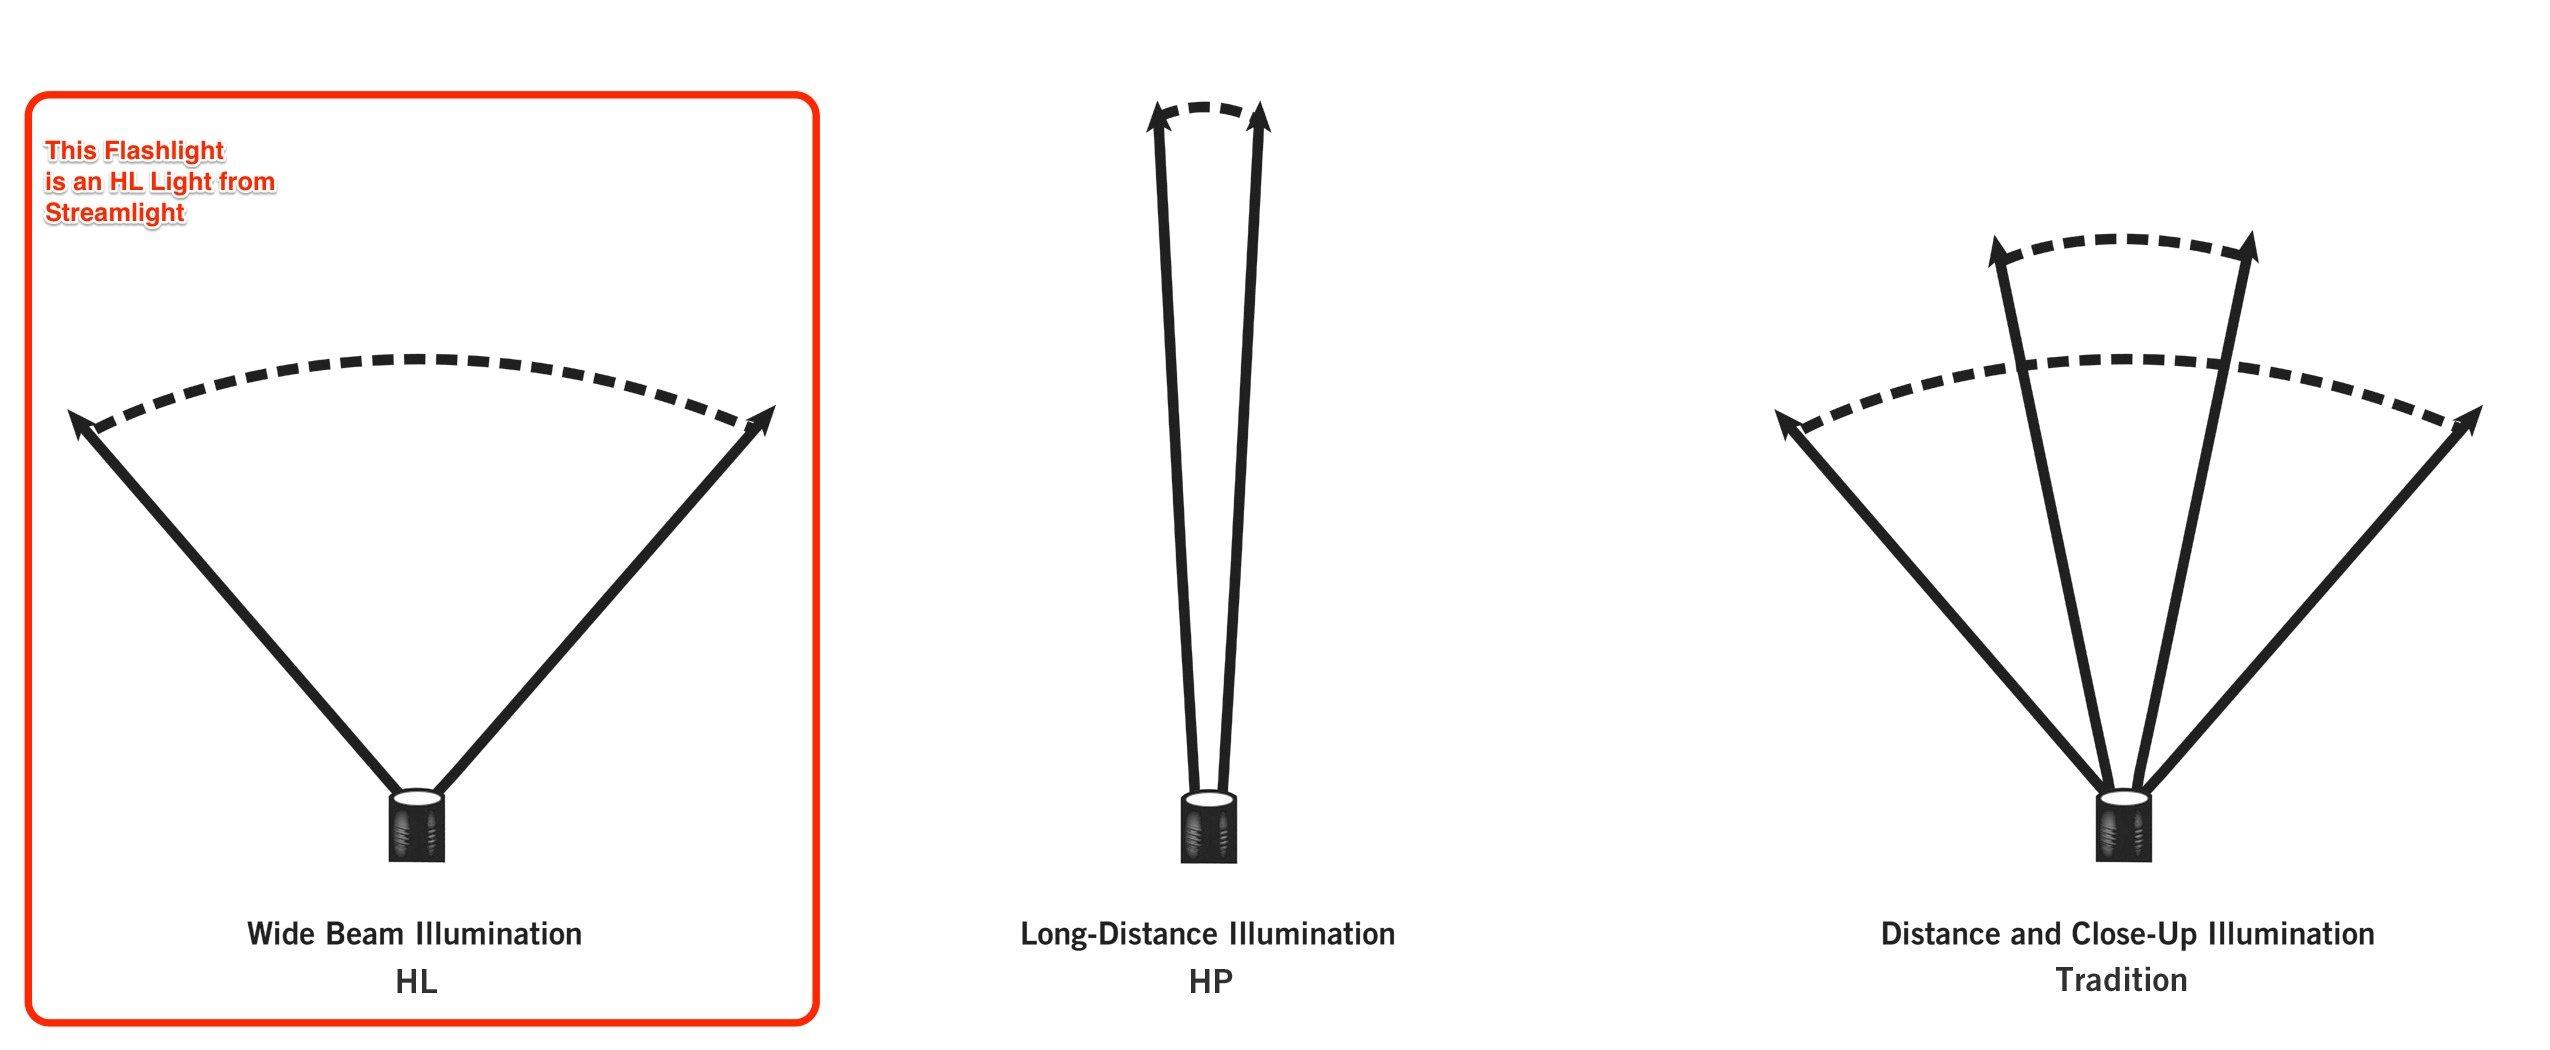 Streamlight 85400 Scorpion High Lumen Tactical Handheld Lithium Power Flashlight - 725 Lumens